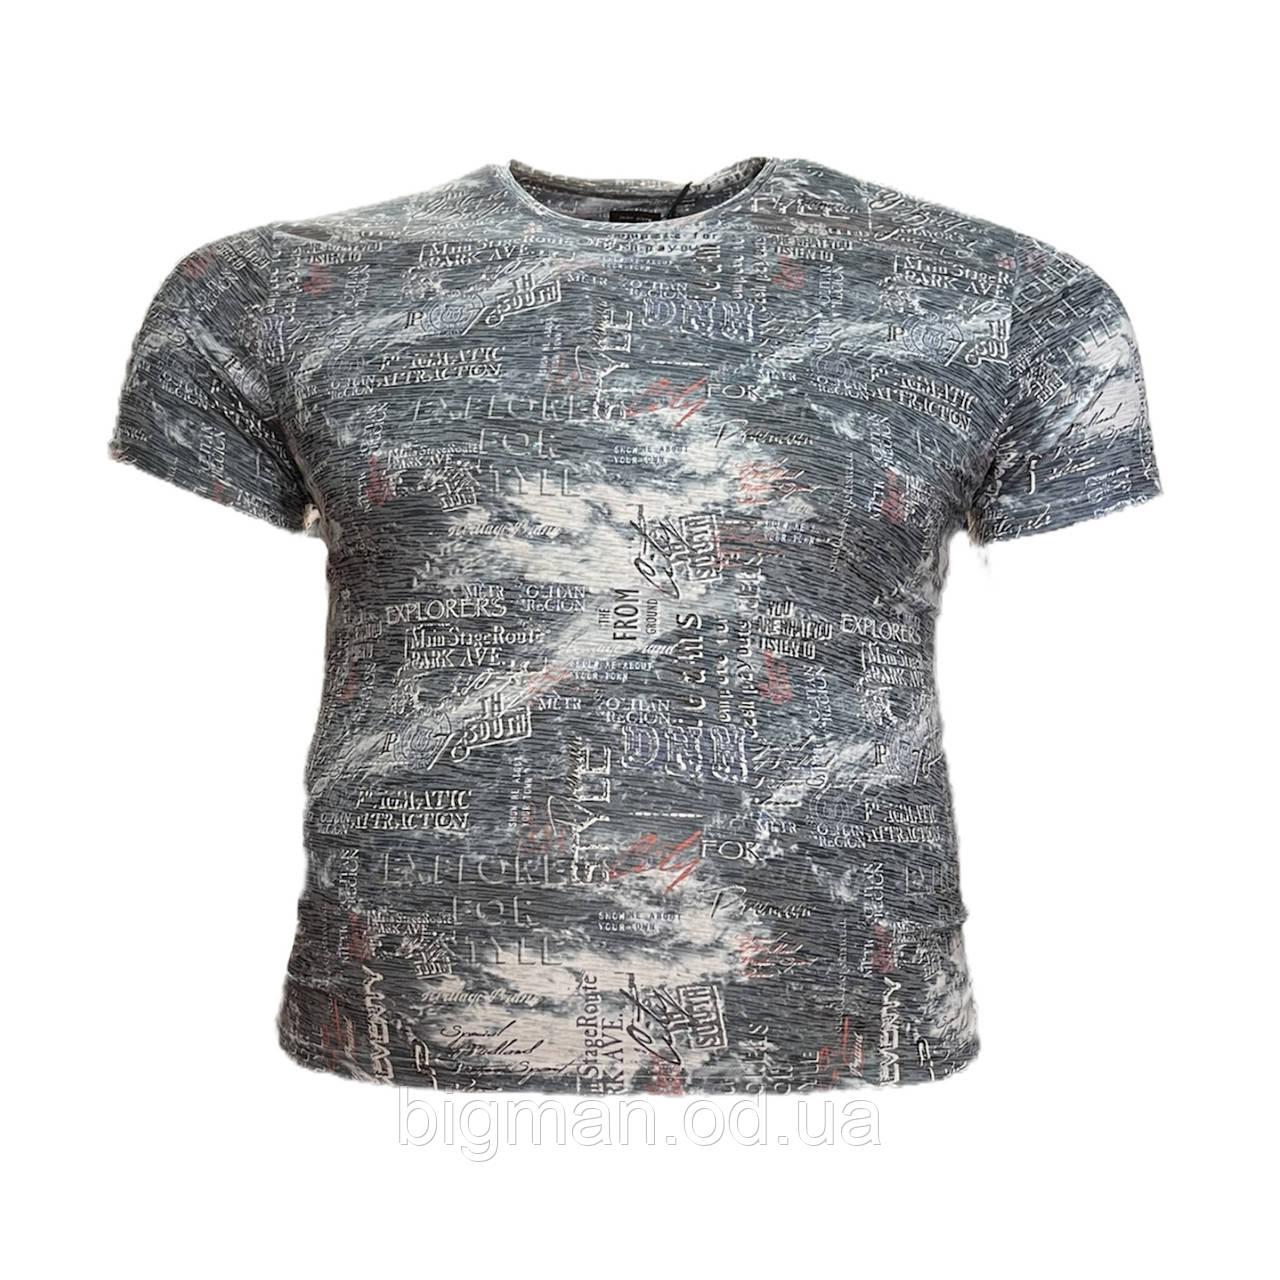 Мужская батальная футболка на резинке Jean Piere 12125 6XL 7XL 8XL серая большие размеры Турция